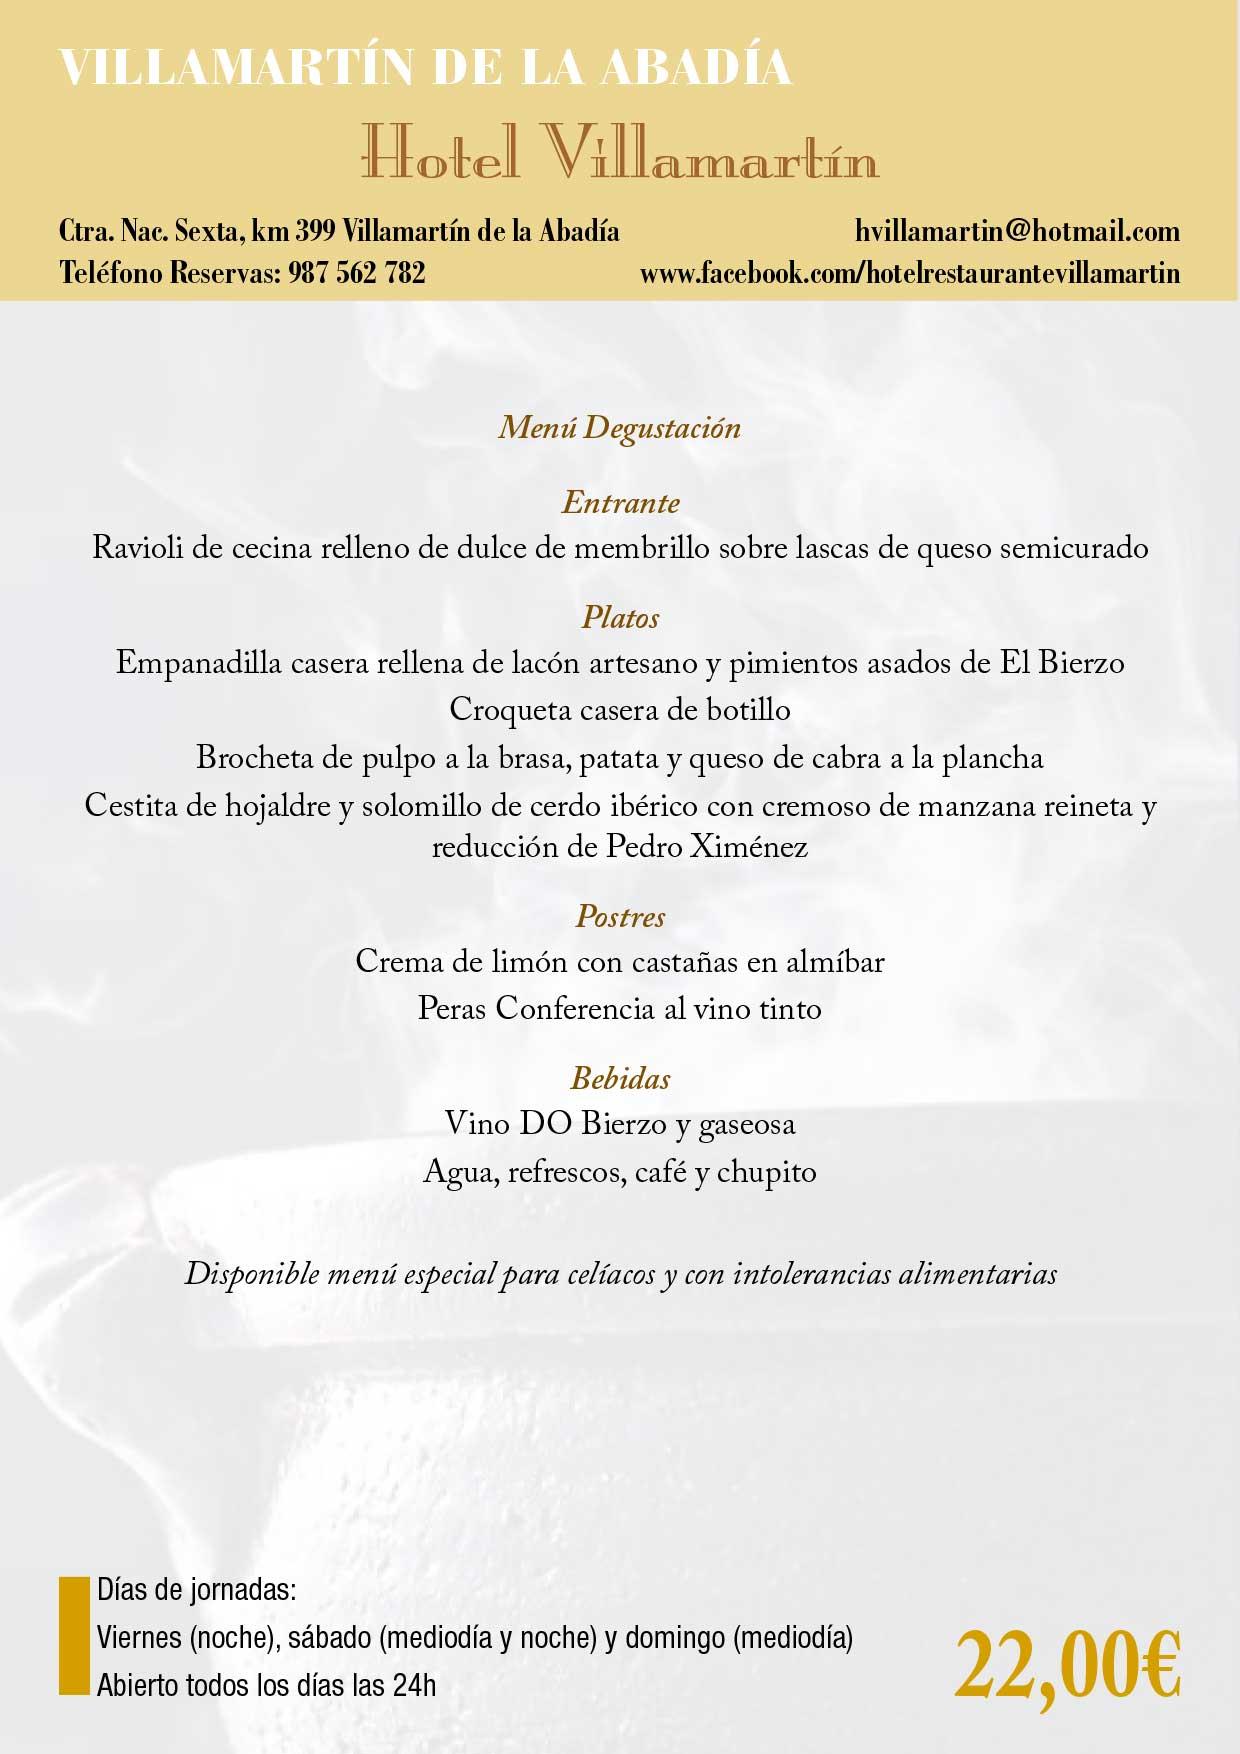 XXXIII Jornadas gastronómicas del Bierzo 2017. Restaurantes participantes 12